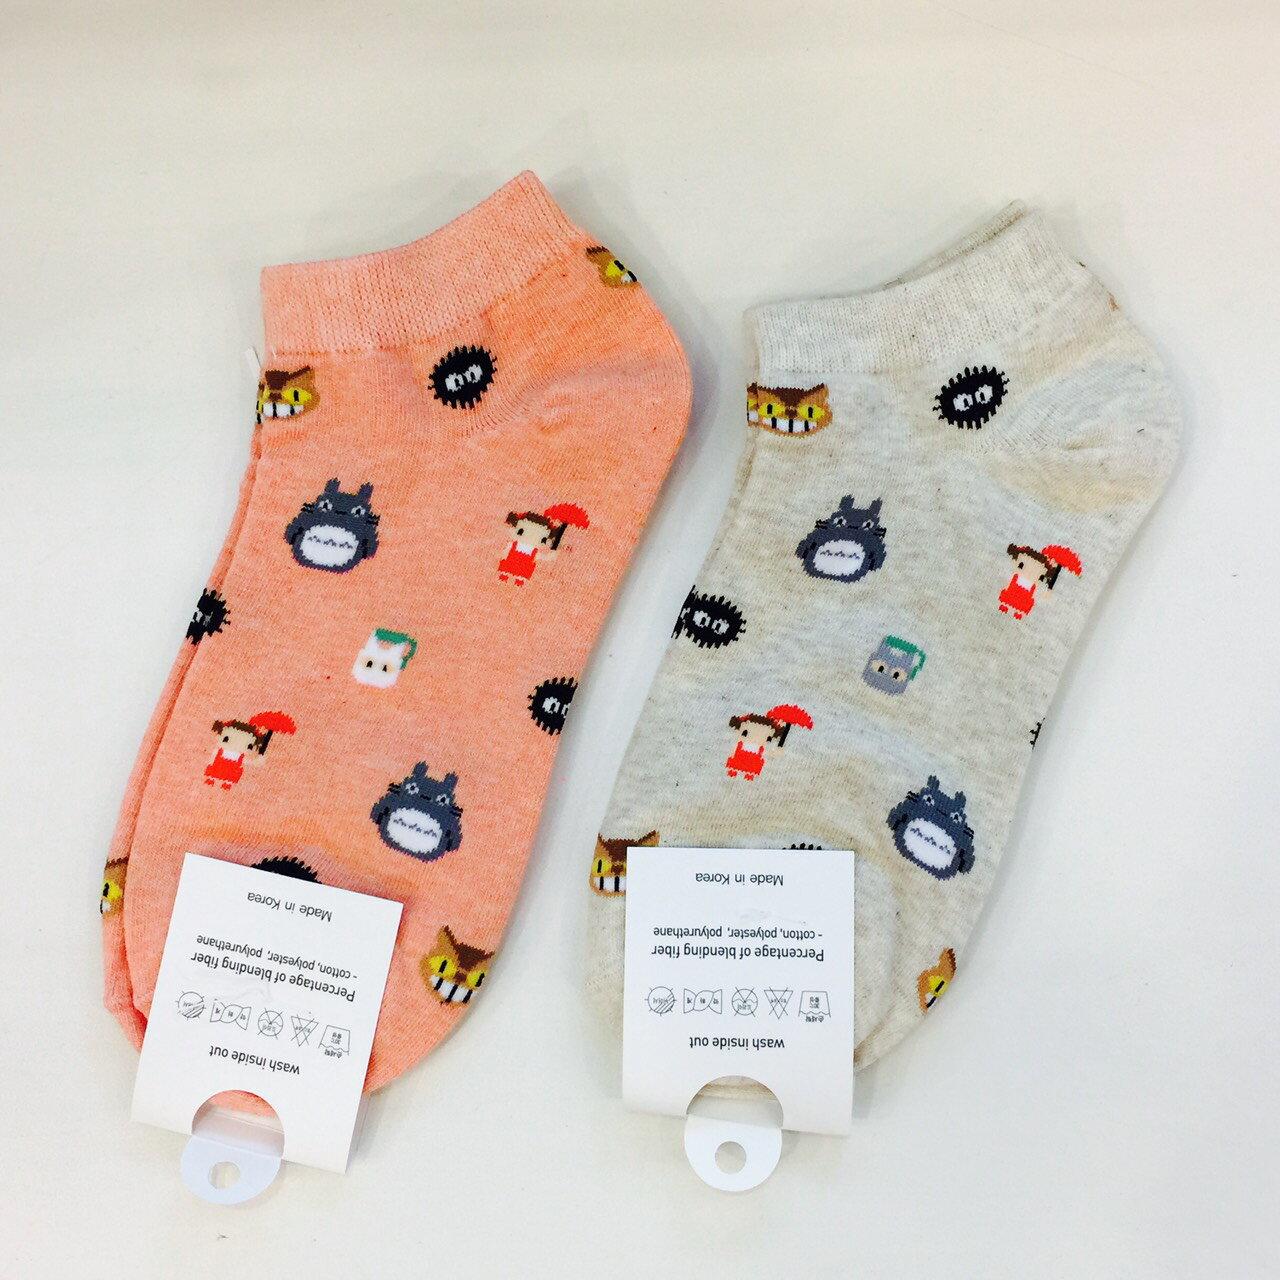 X射線【C190003】KIsssocks 龍貓Totoro 短襪(22-25cm)2款選1,大人/小孩短襪/船型襪/sanrio卡通/襪子